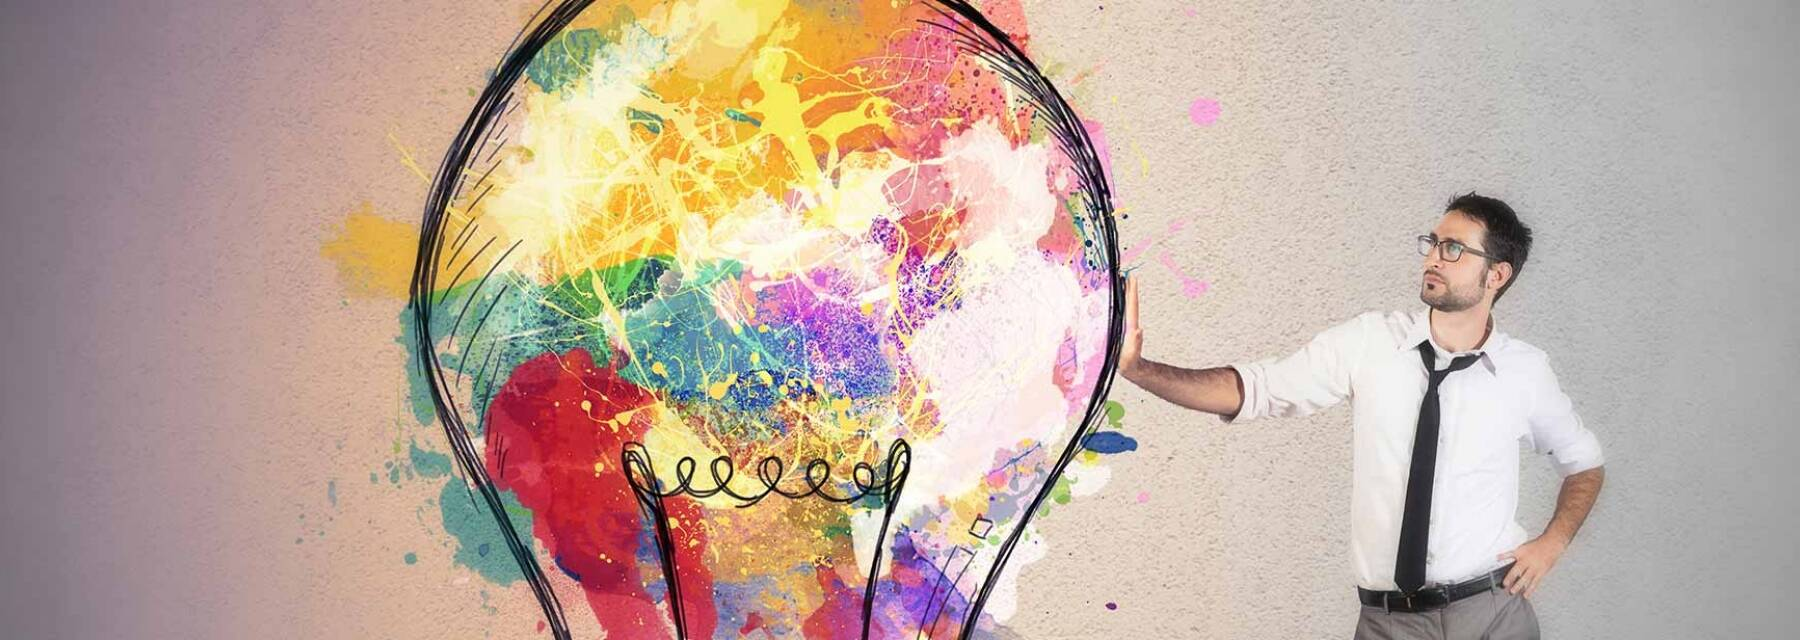 Creative-Marketing-Production-Services-Company